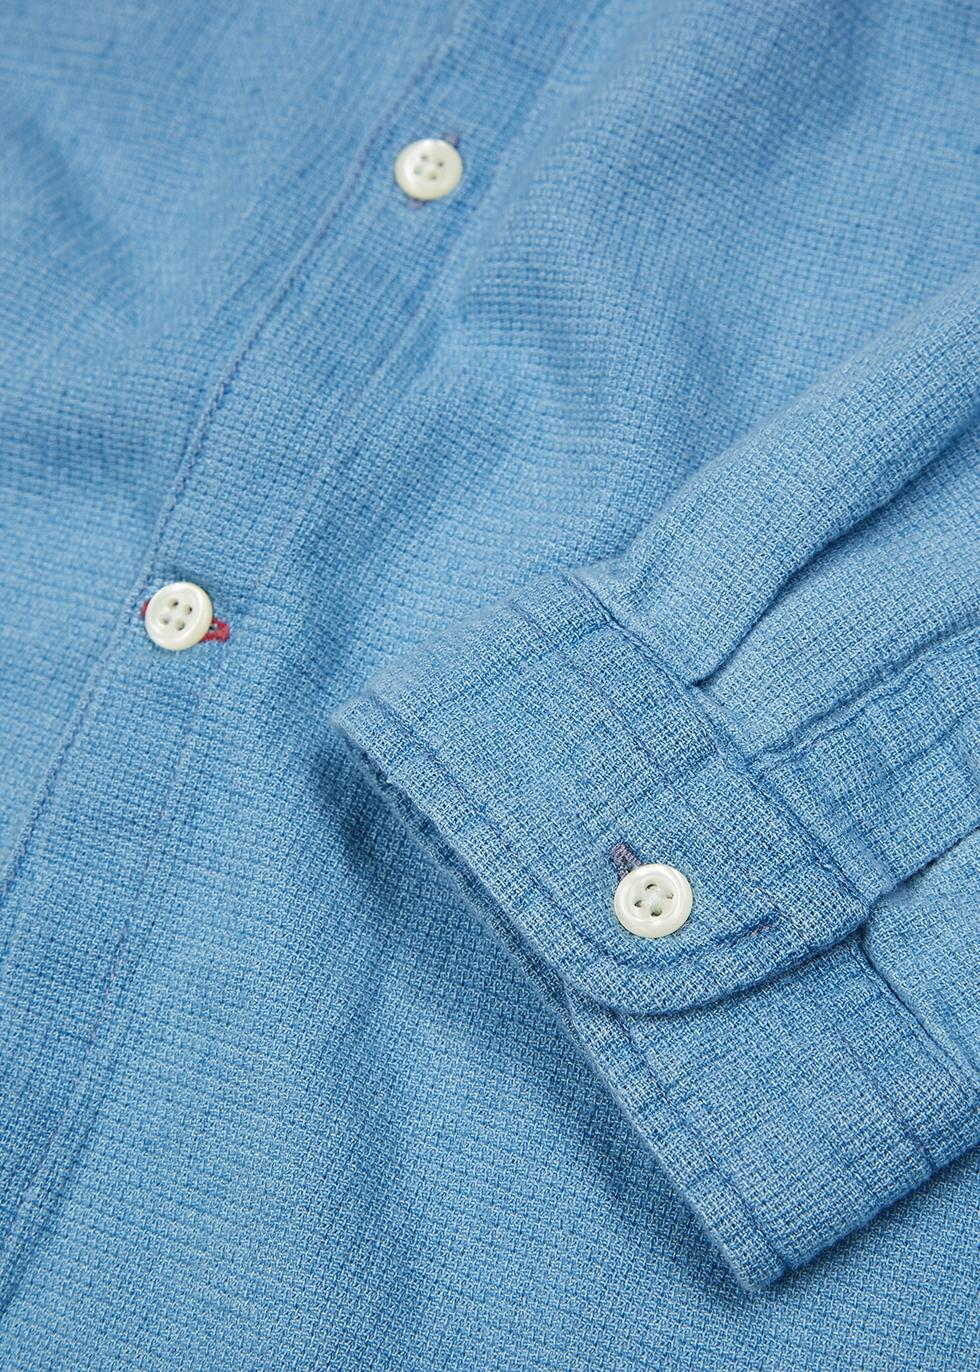 Kildale blue cotton chambray shirt - Oliver Spencer